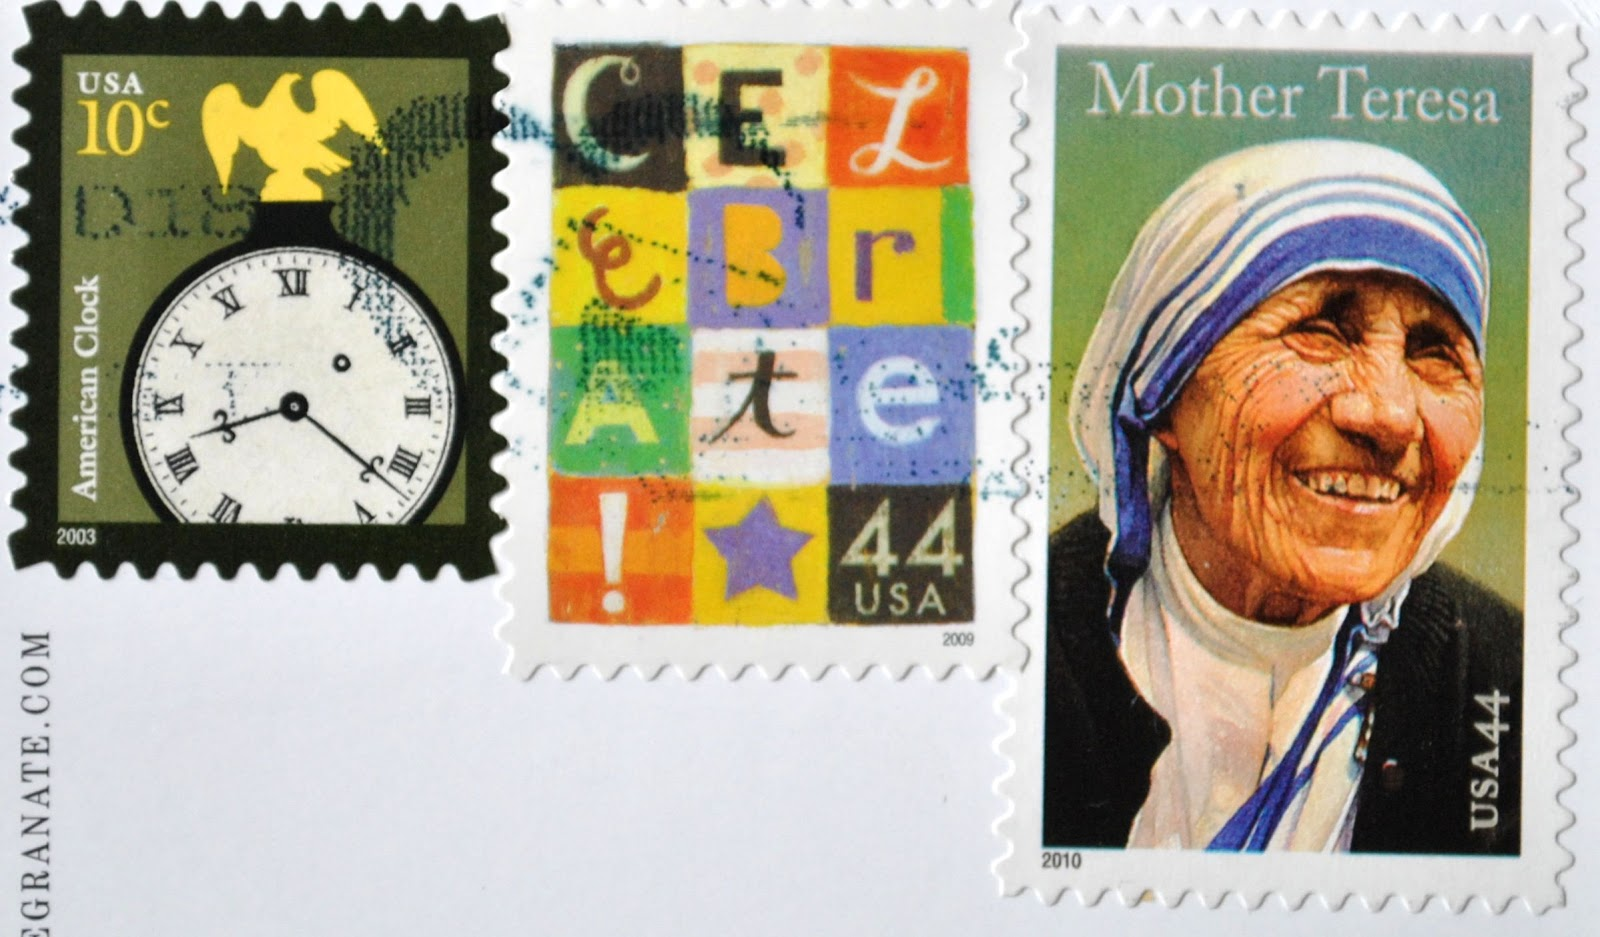 znaczek z Matką Teresą